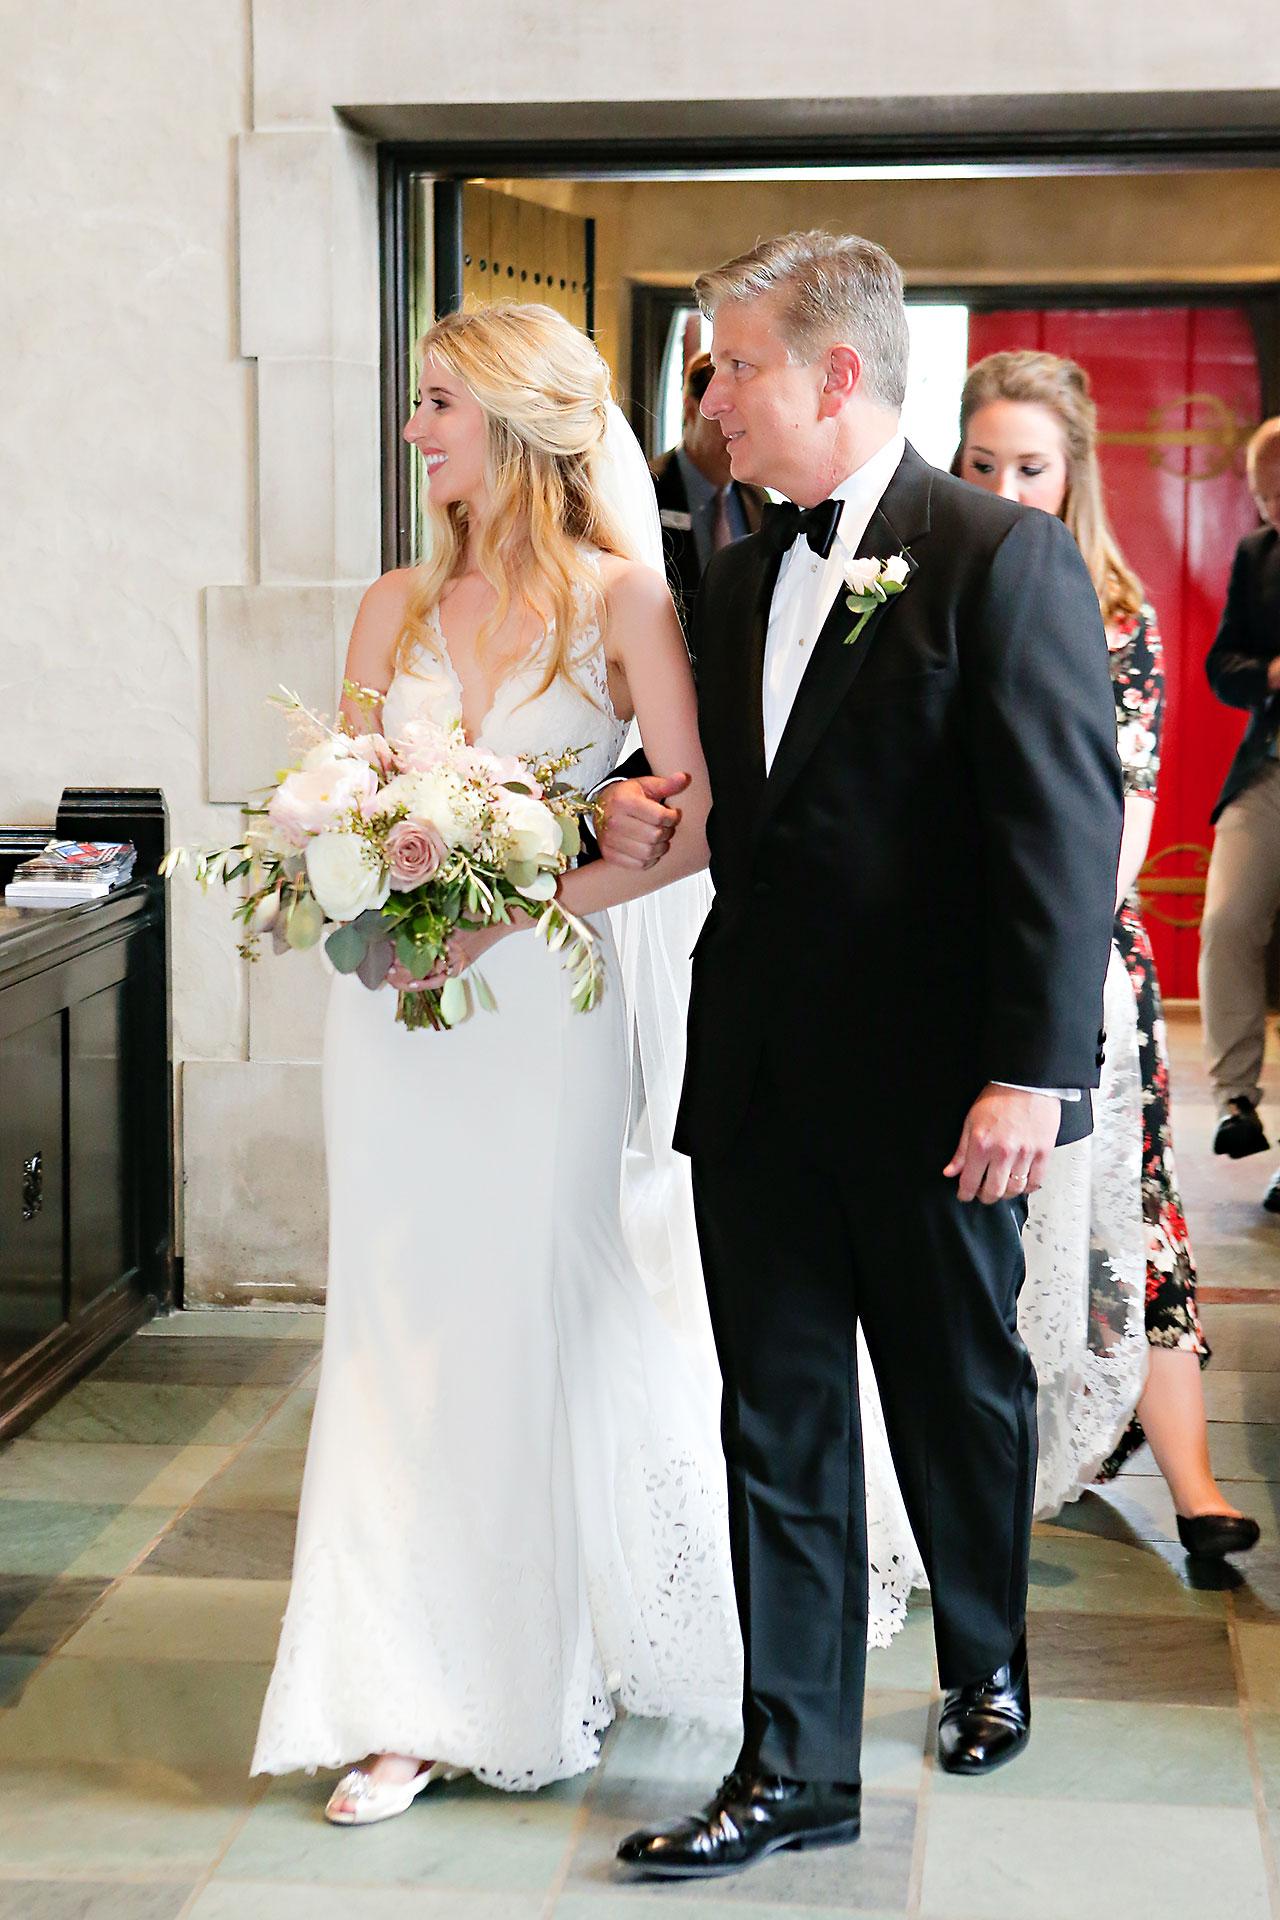 Allison Jeff Union Station Crowne Plaza Indianapolis wedding 232